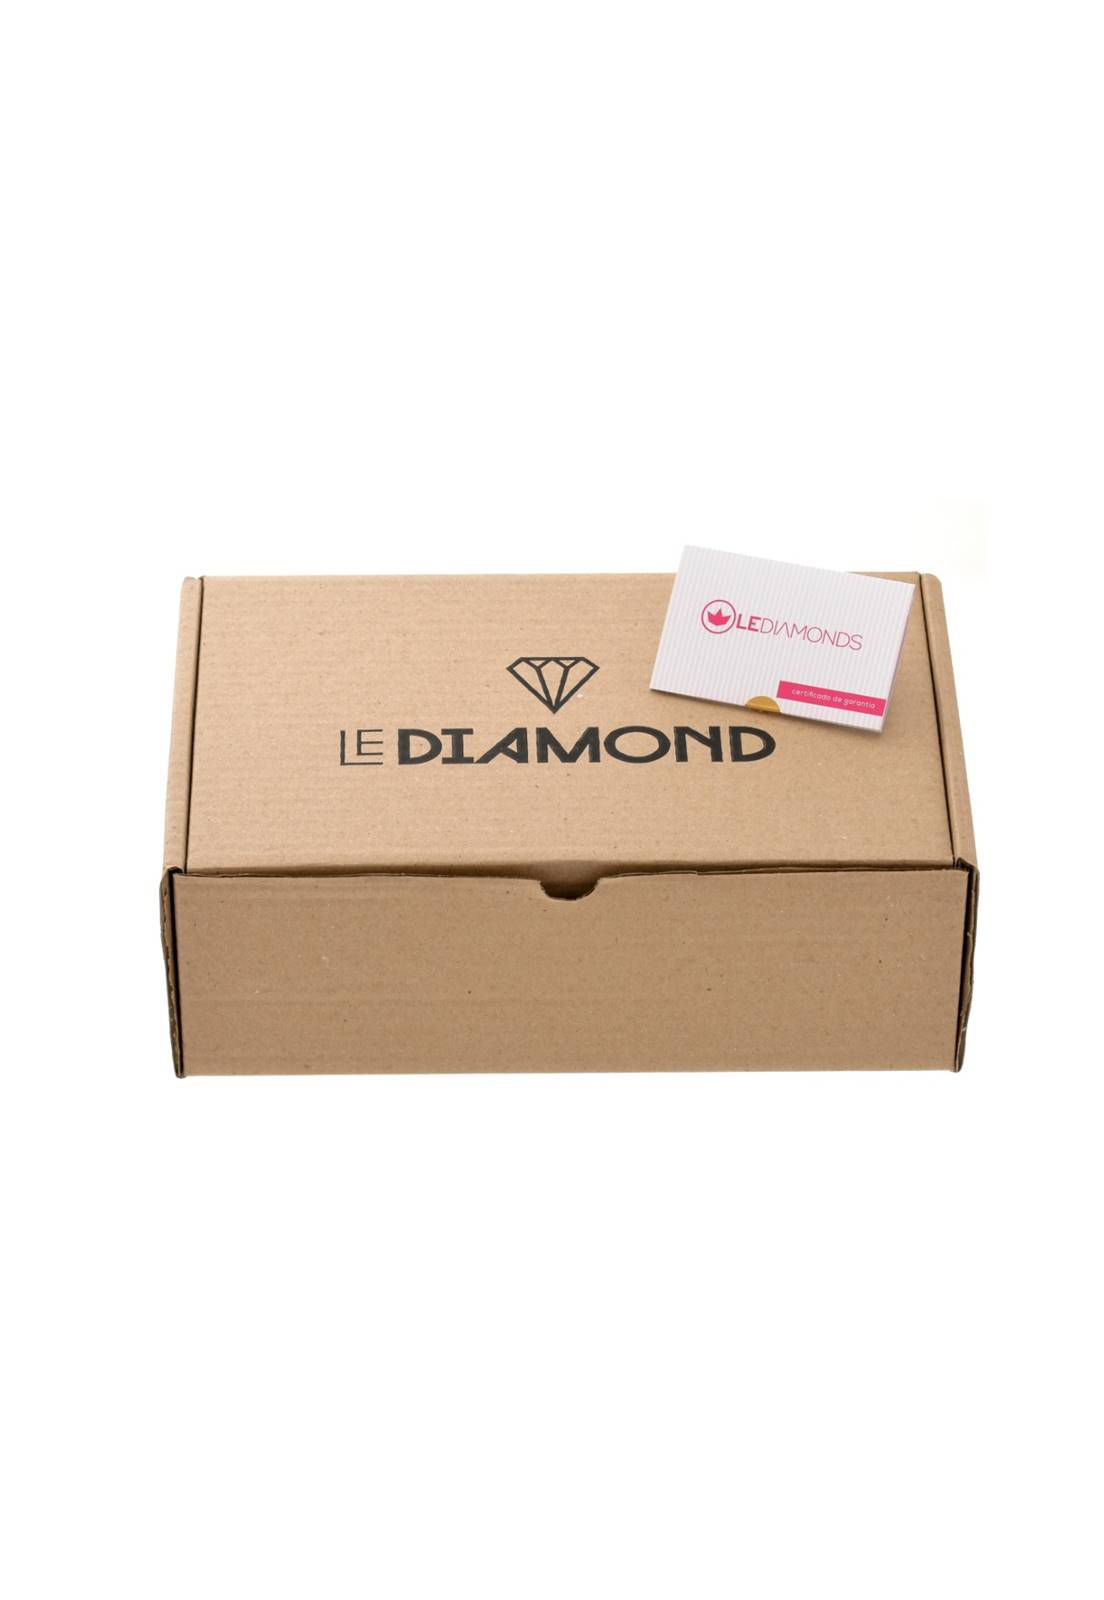 Brinco Le Diamond Madrepérola Flor de Resina Turquesa